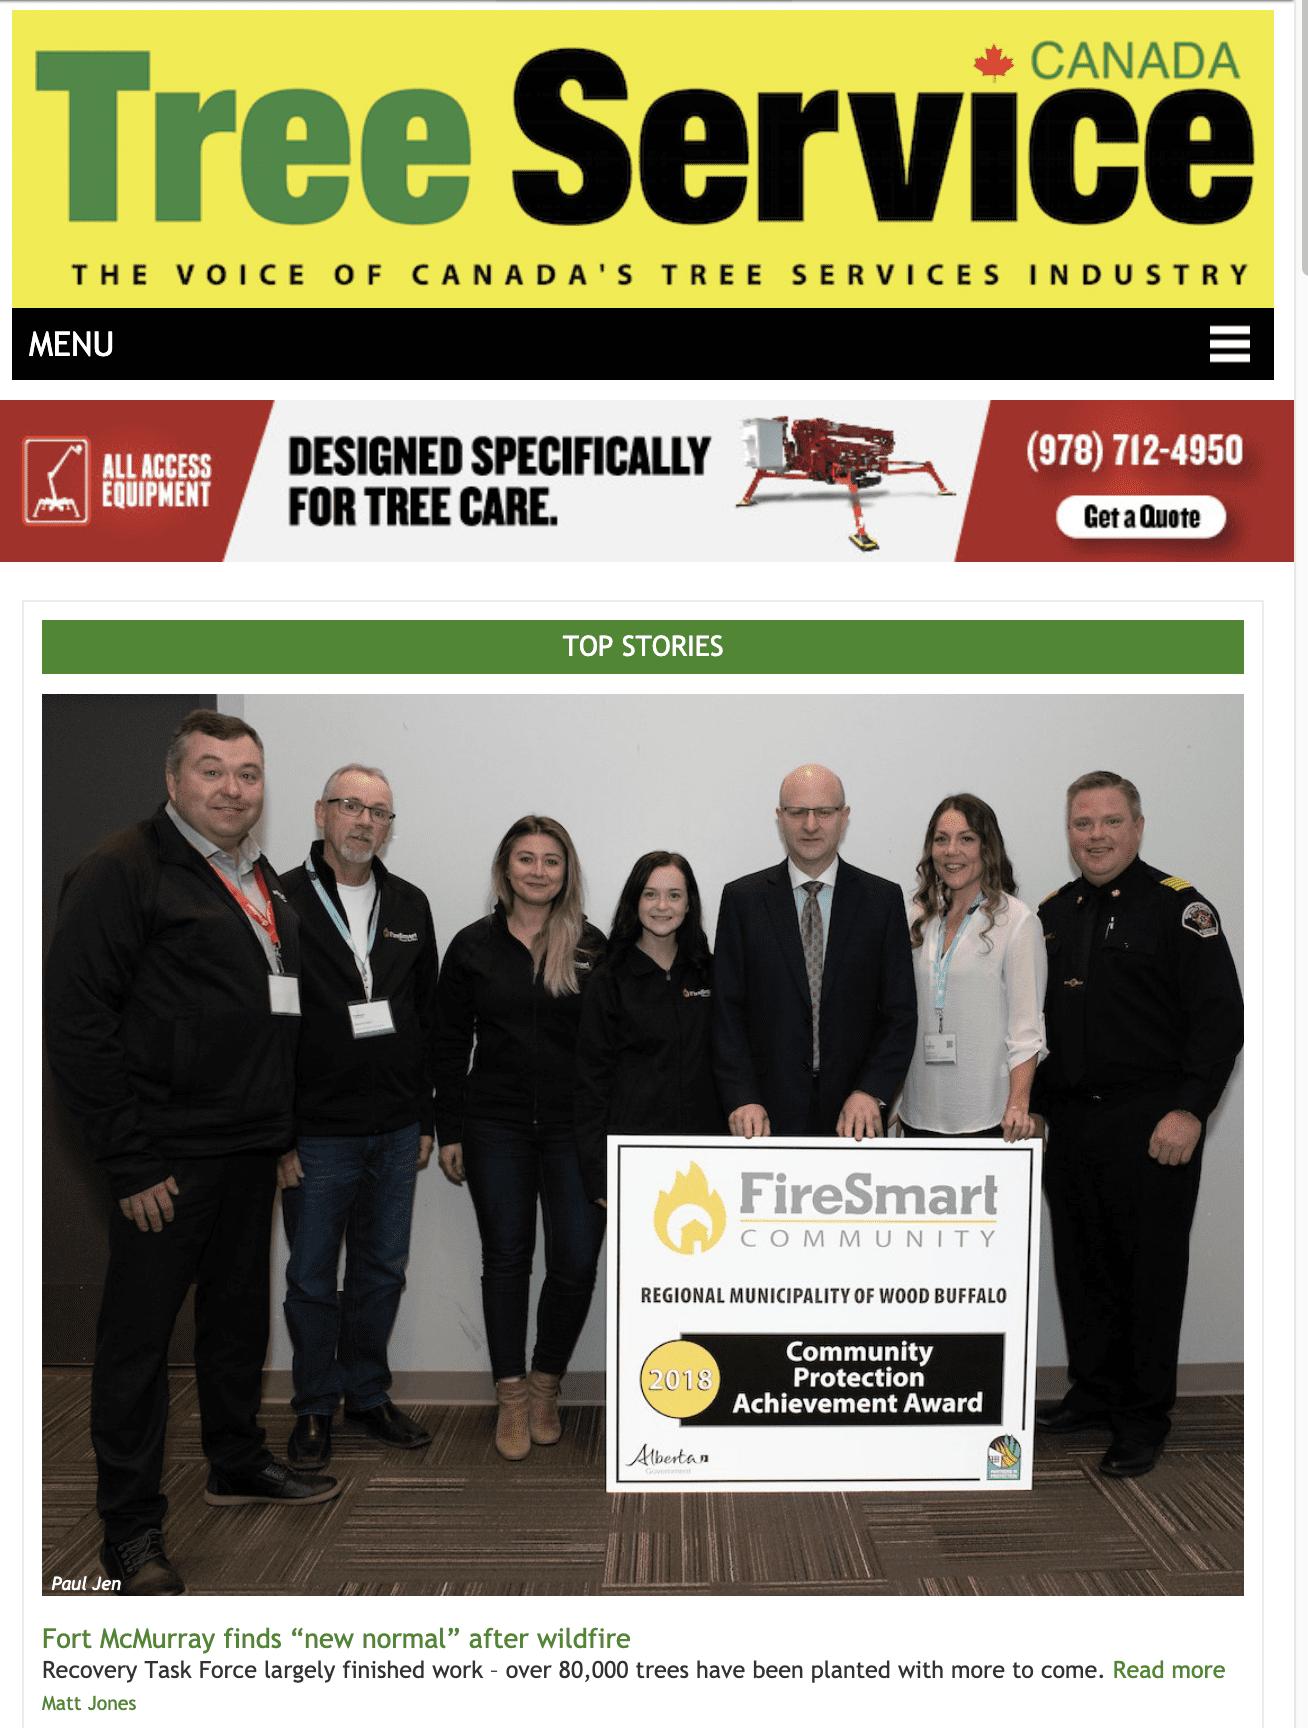 Tree Service Canada – website 20190530